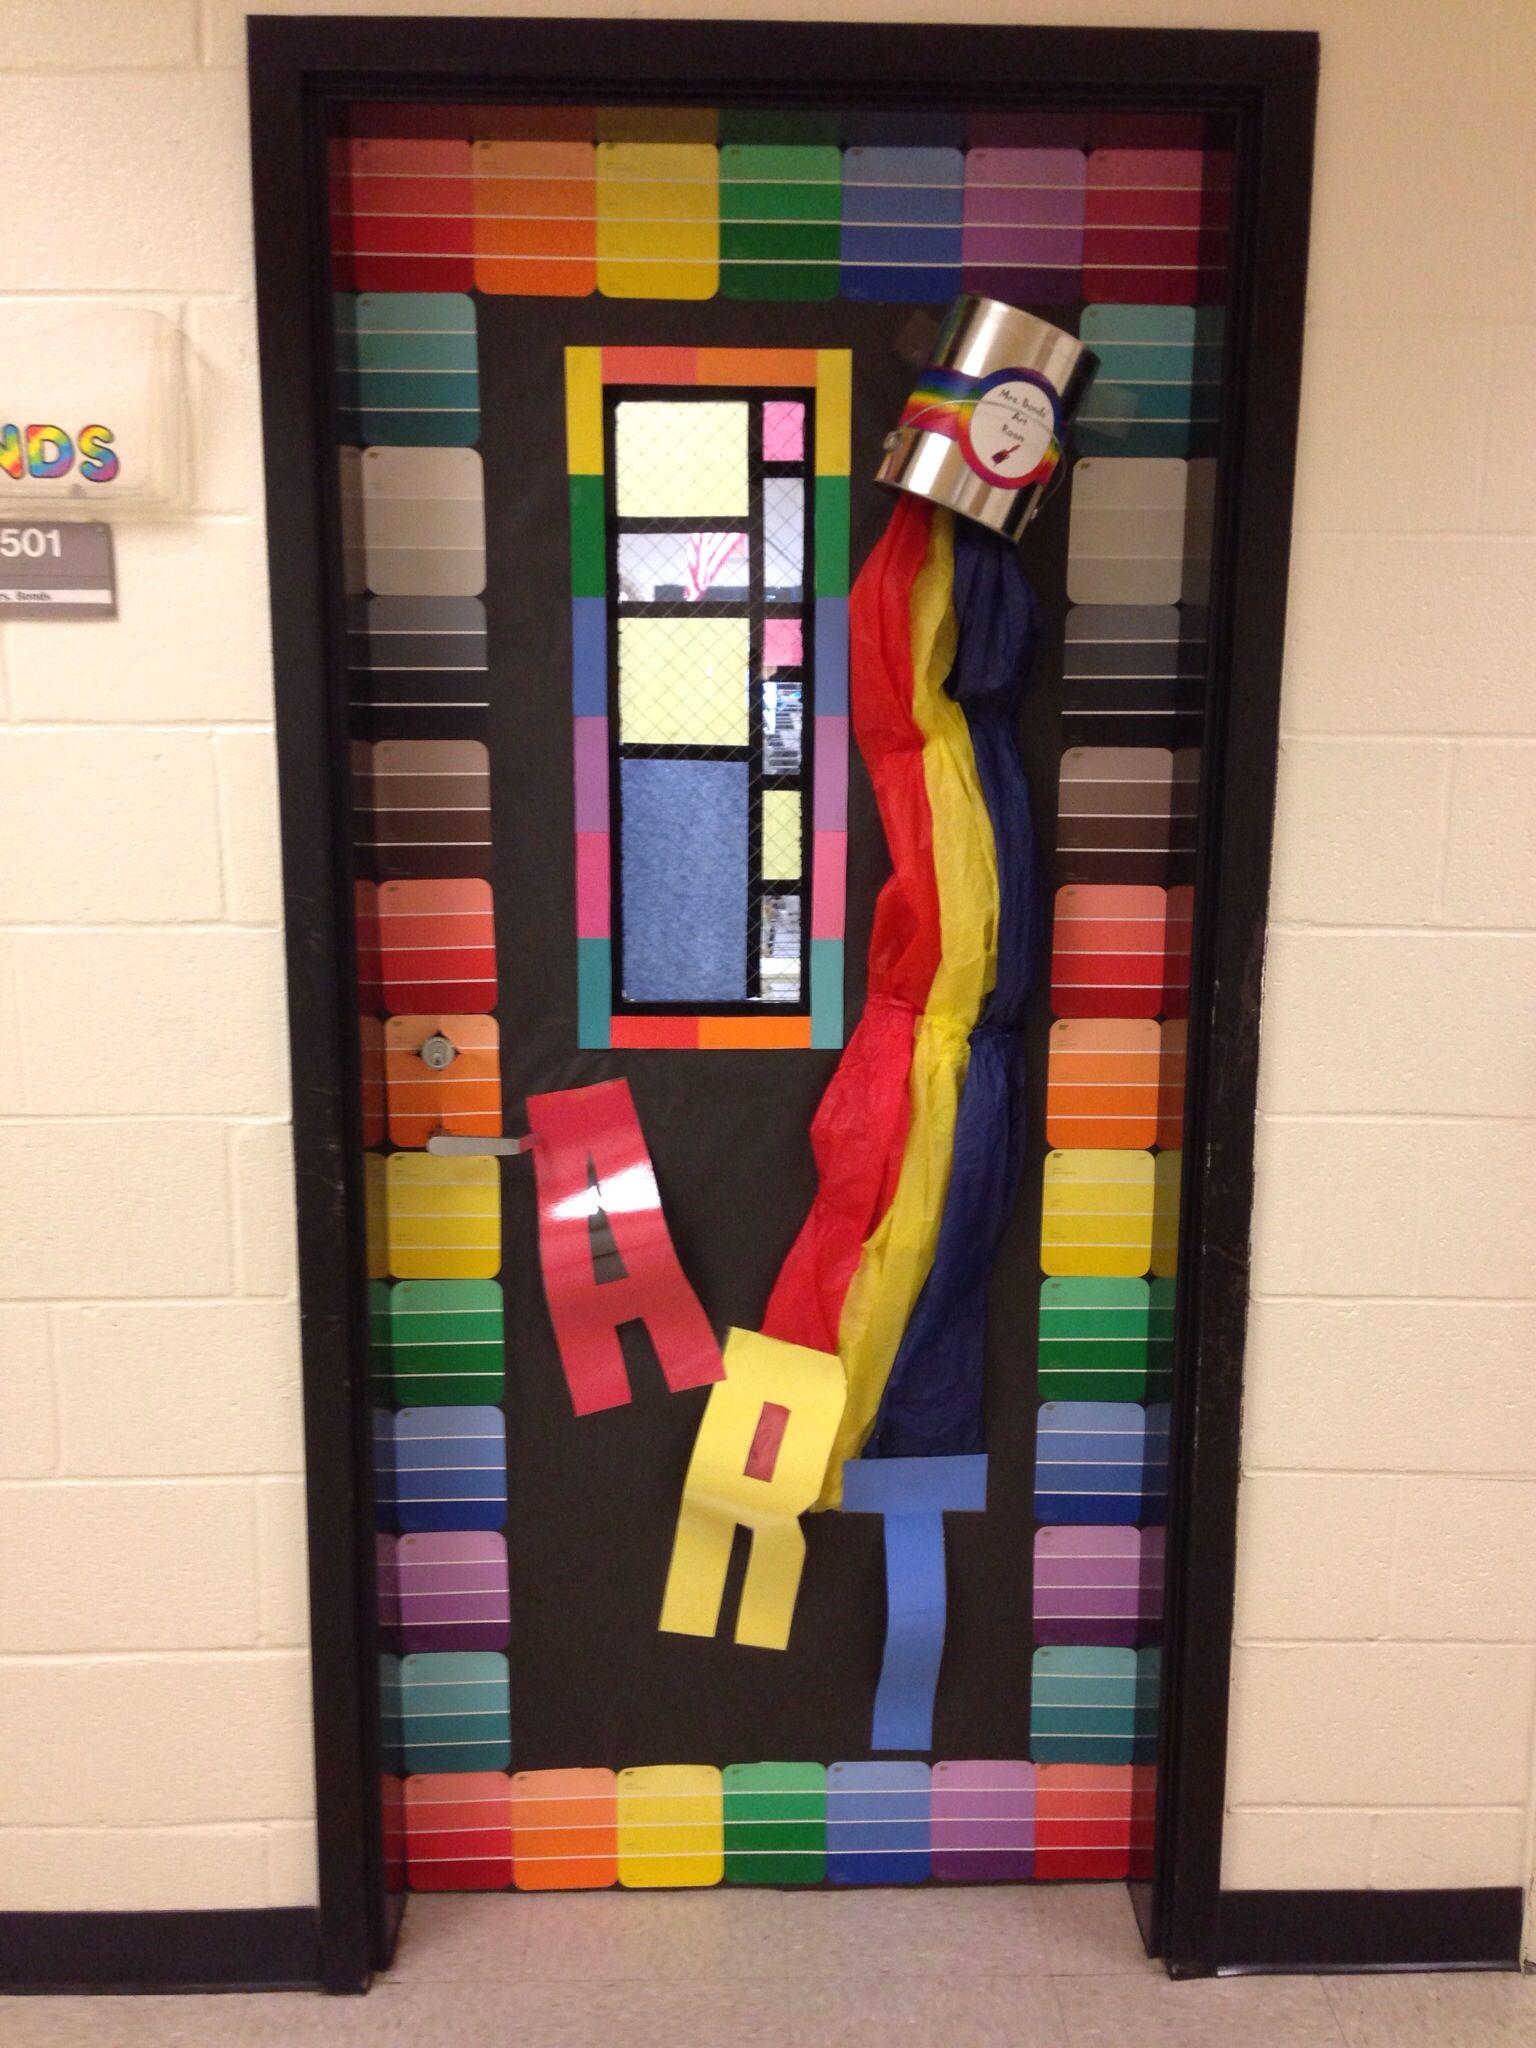 Genial Art Classroom Door, Art Classroom Management, Classroom Ideas, Art Room  Doors, Board